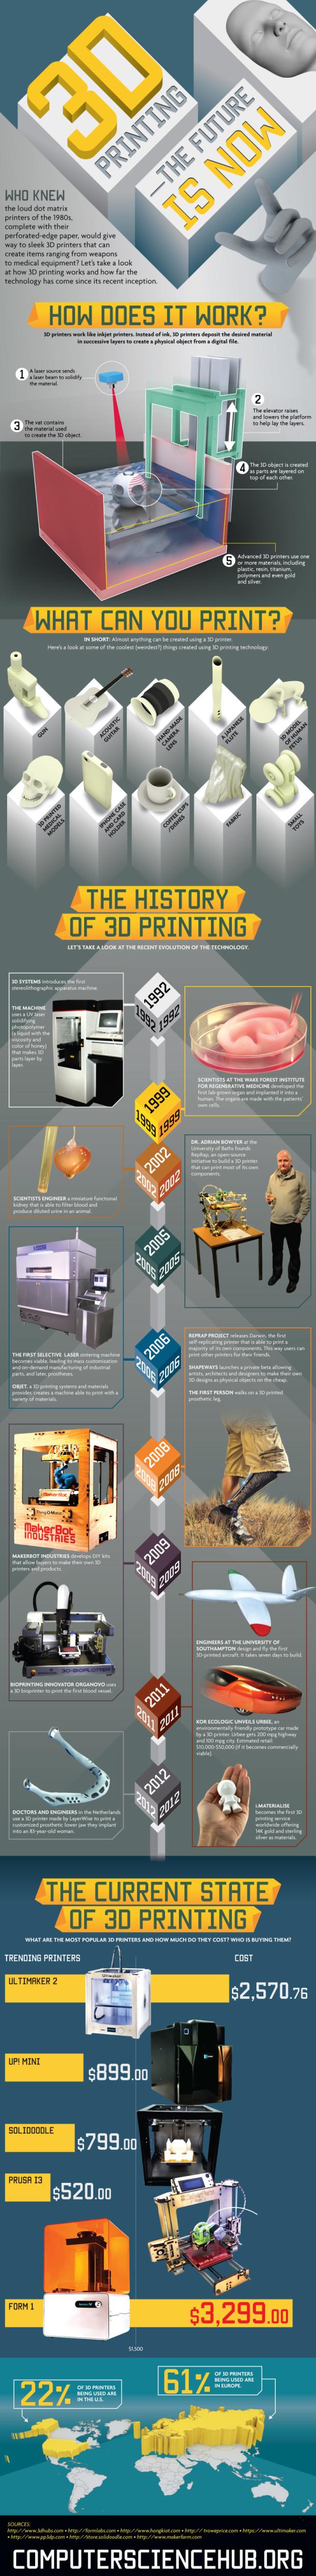 Storia stampa stampante 3d